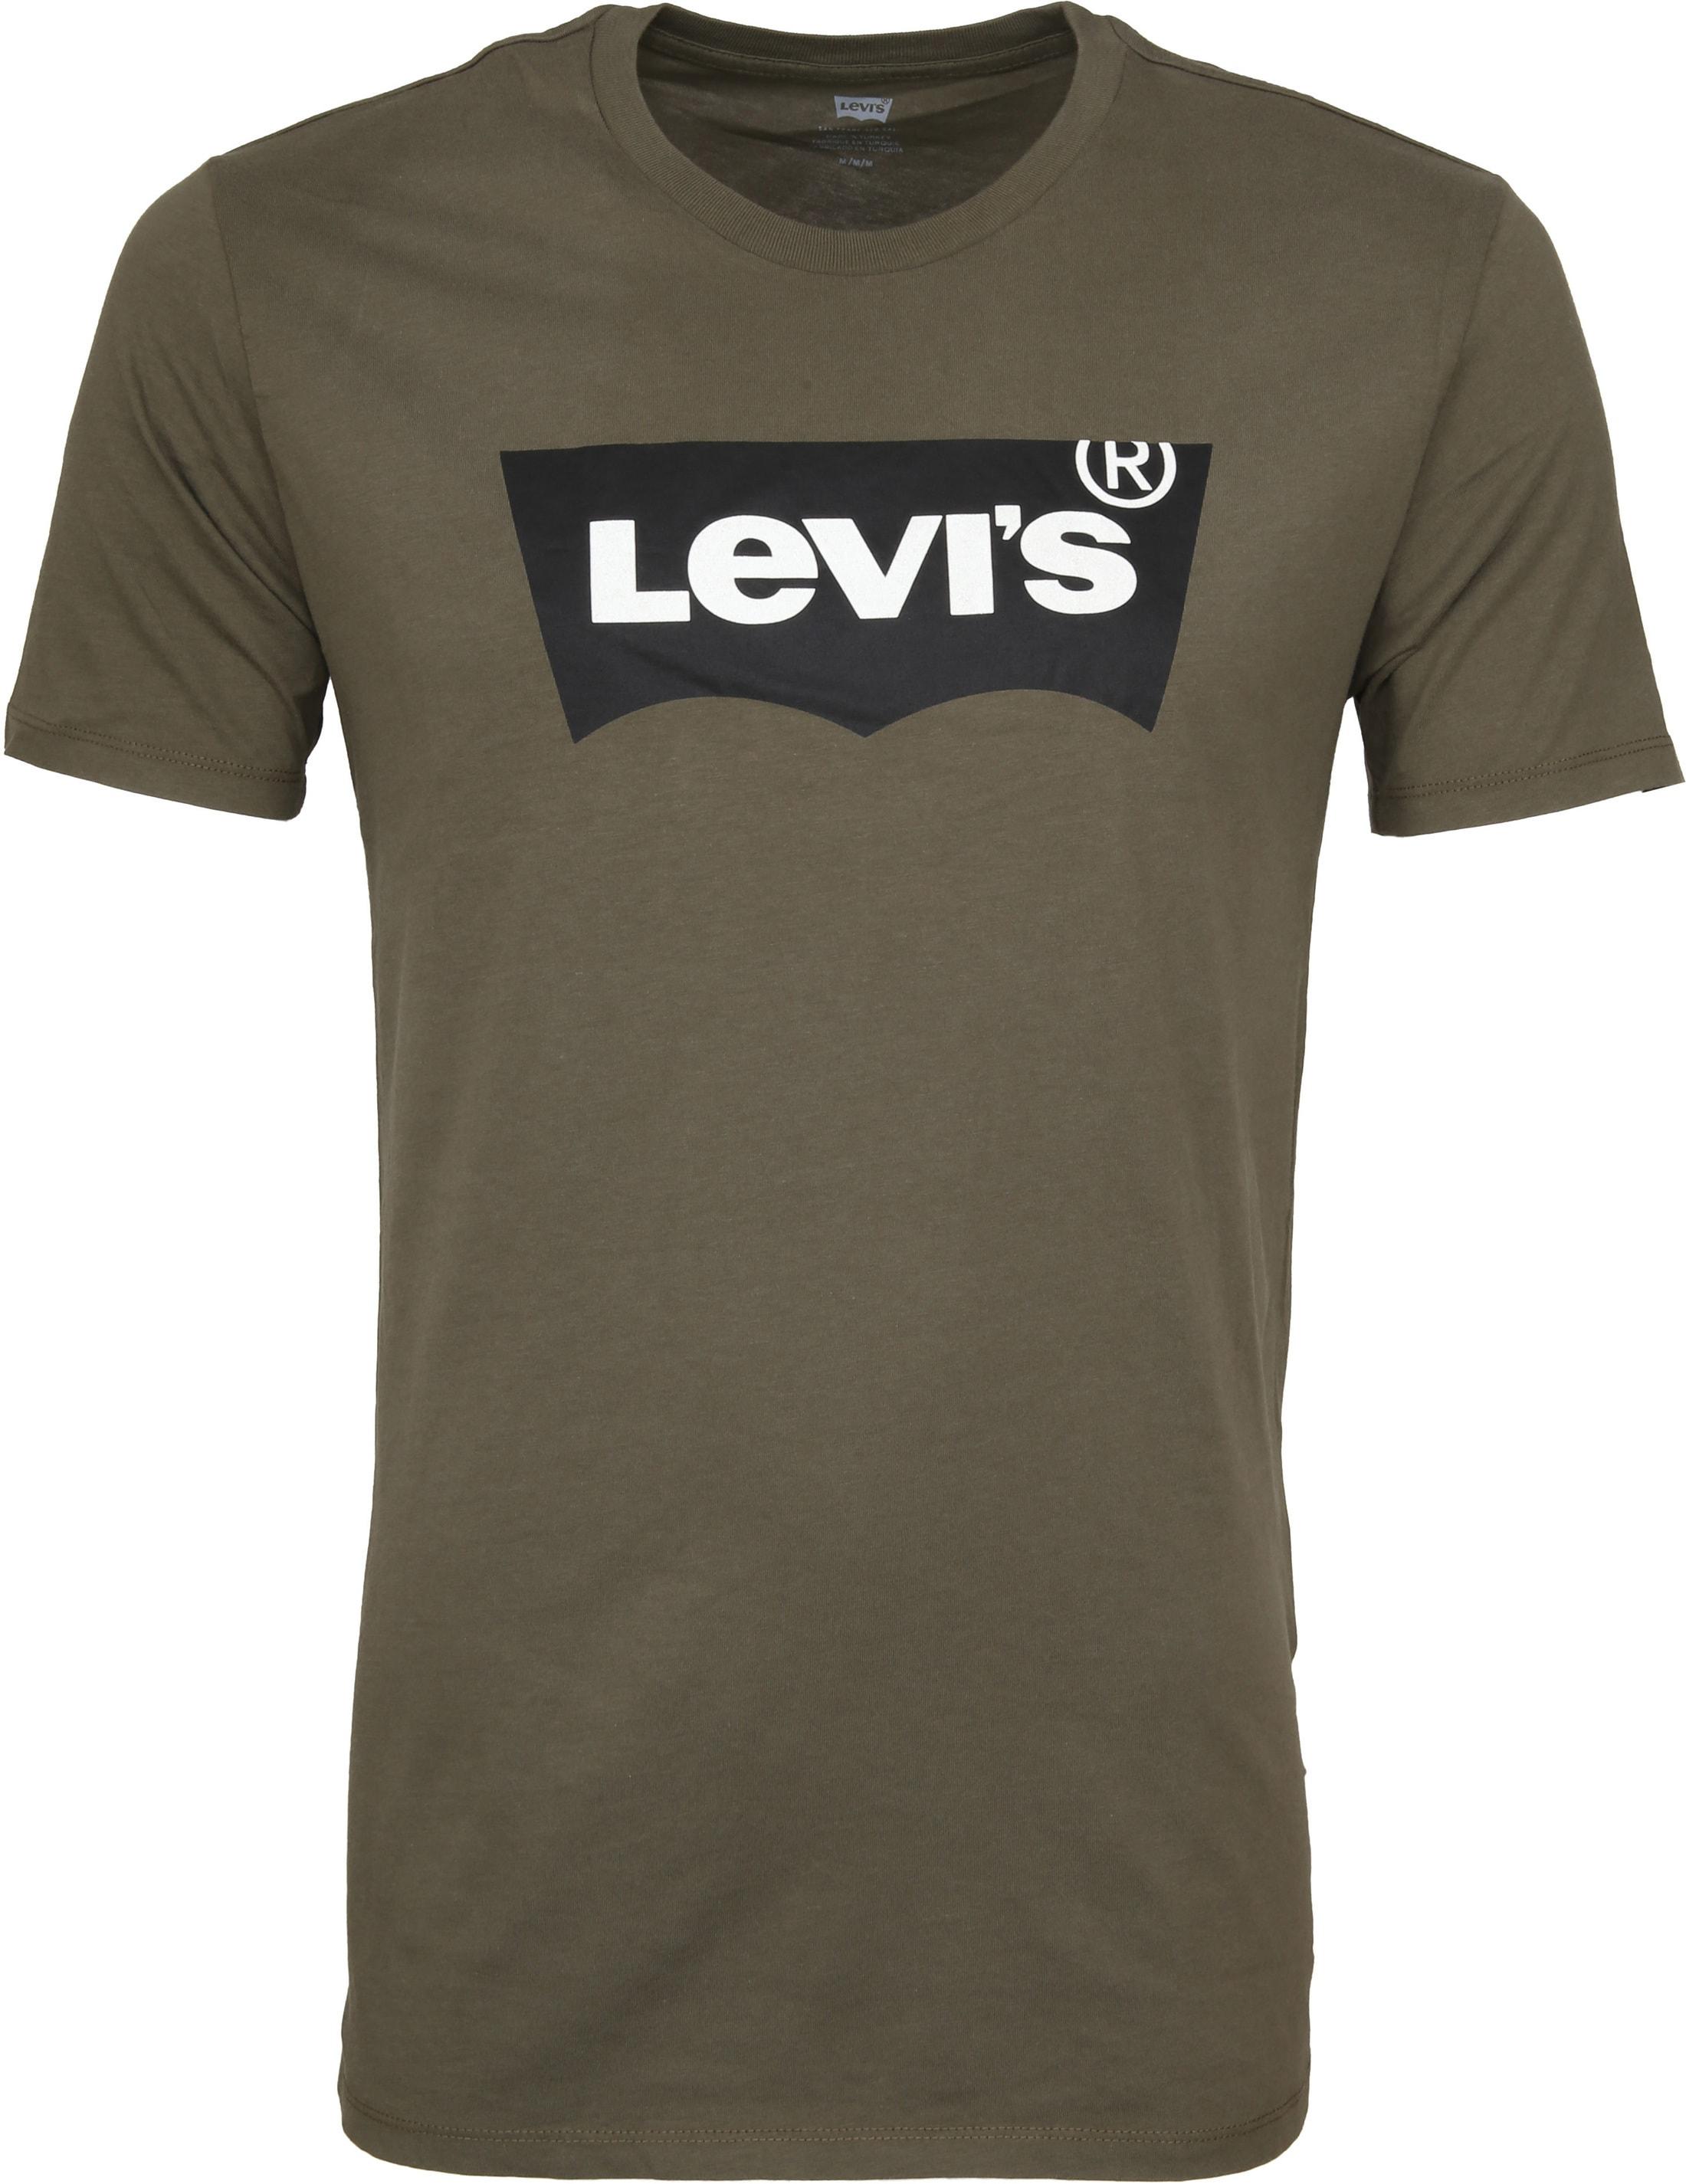 Levi's T-shirt Green Logo foto 0